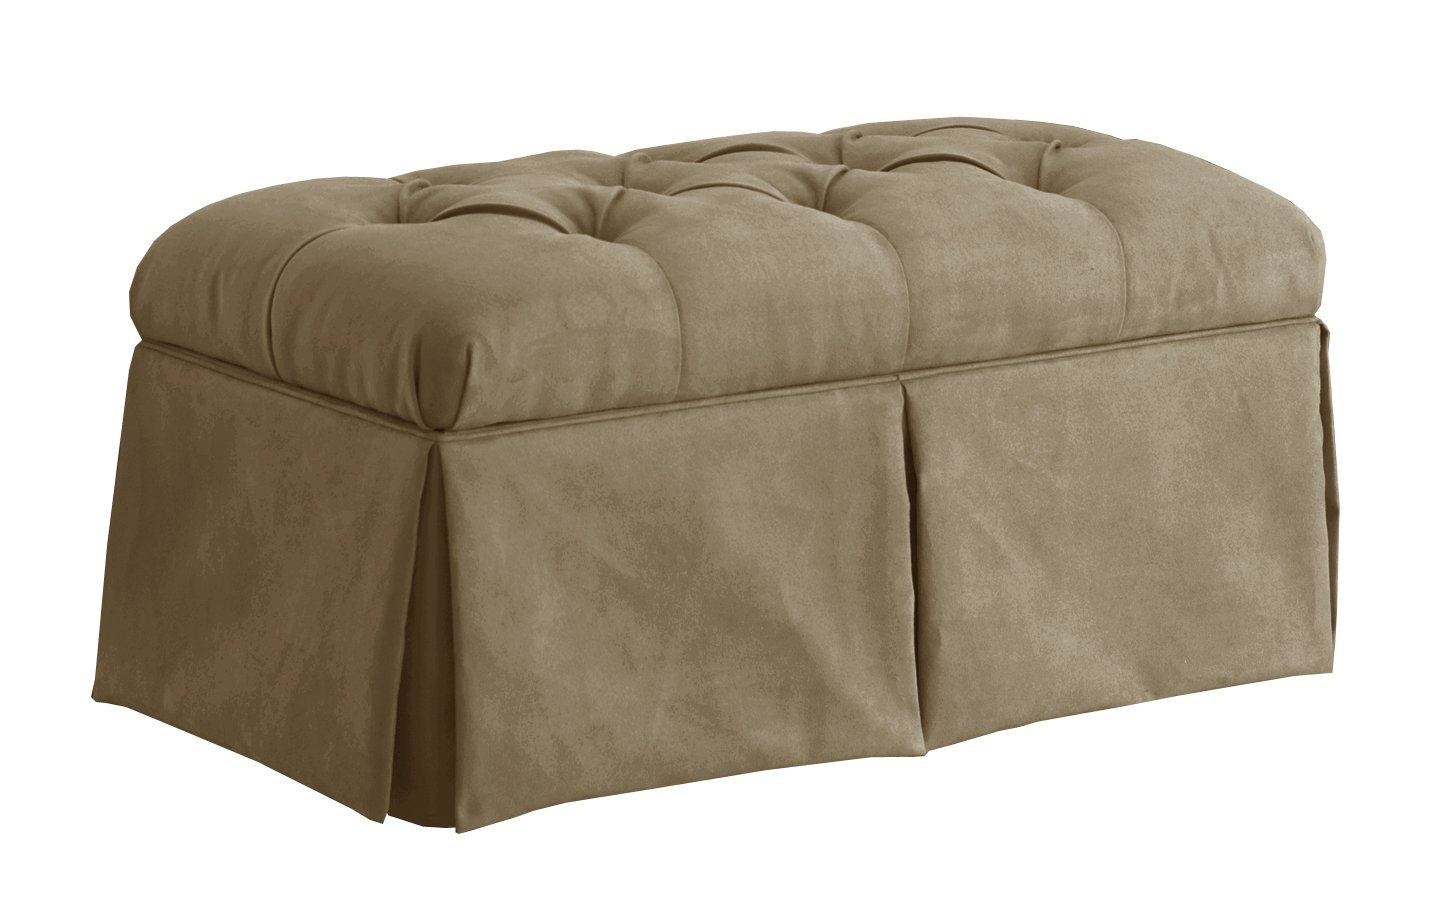 Amazon.com: Skyline Furniture Velvet Skirted Storage Bench, Aubergine:  Kitchen U0026 Dining